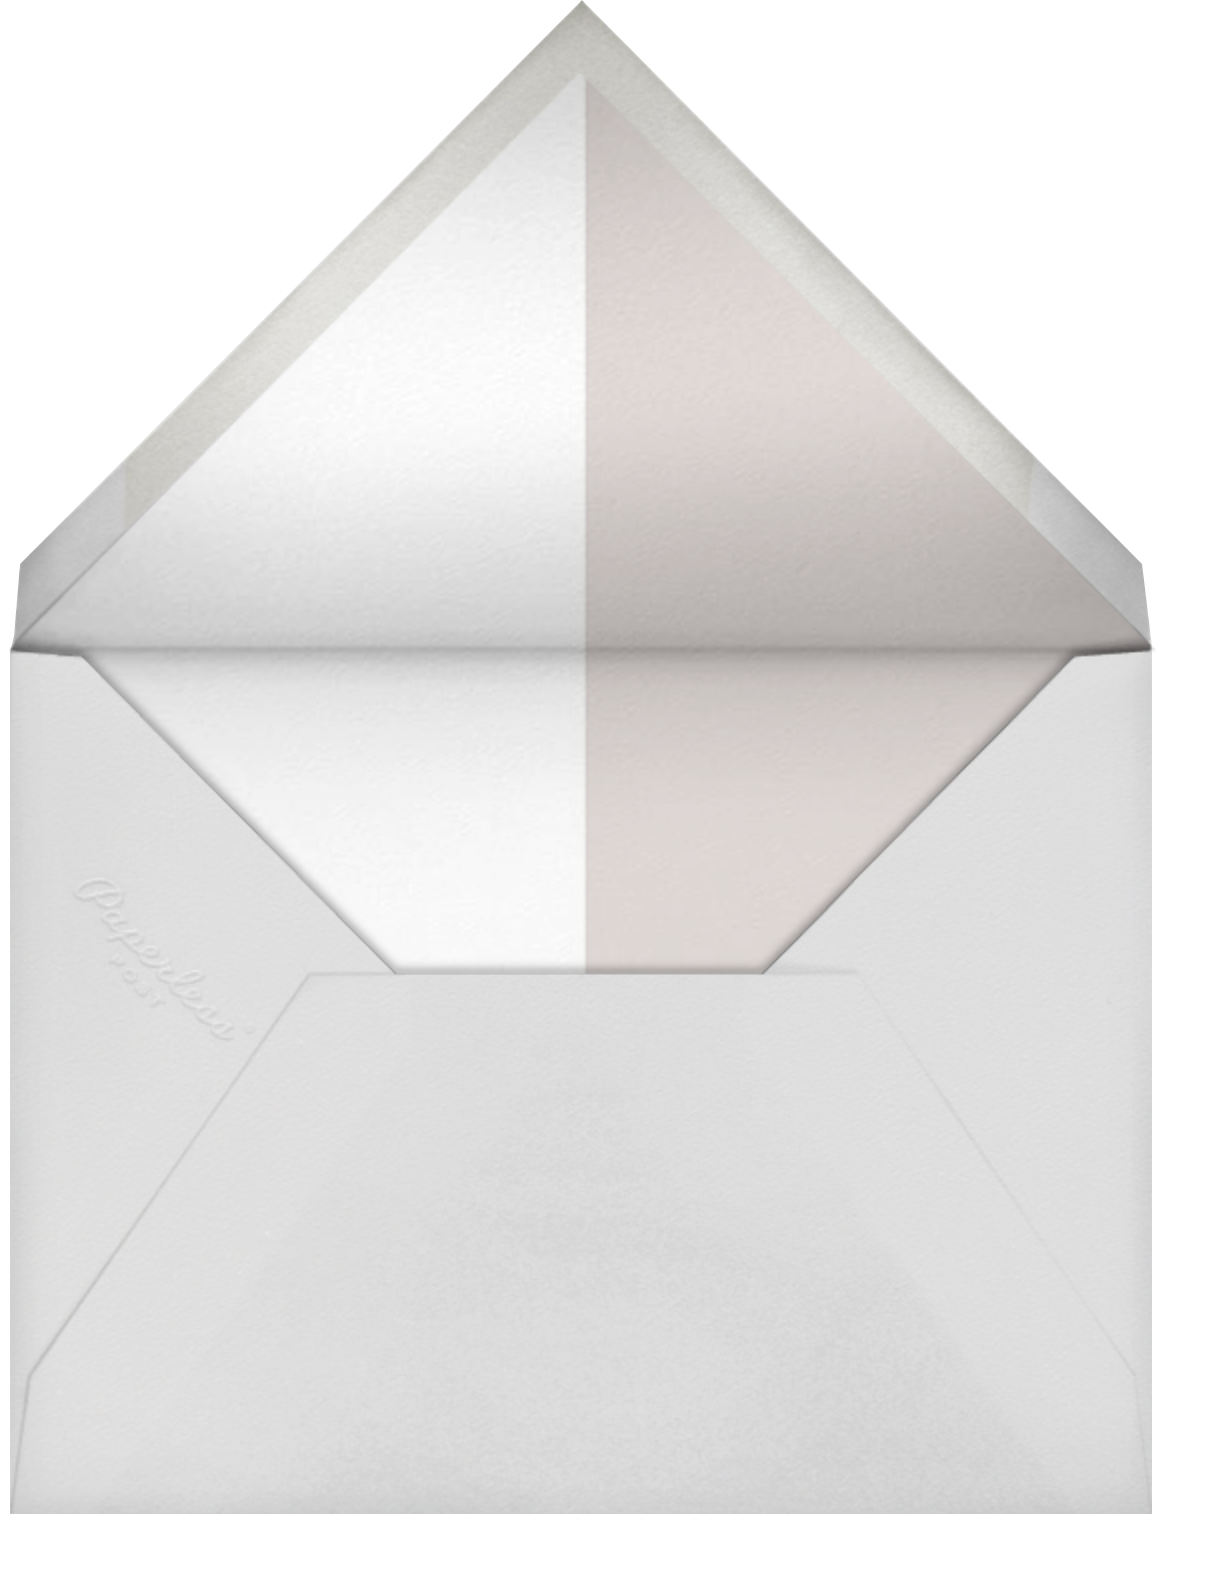 Burgoyne (Invitation) - Oyster/Gold - Paperless Post - Virtual wedding - envelope back